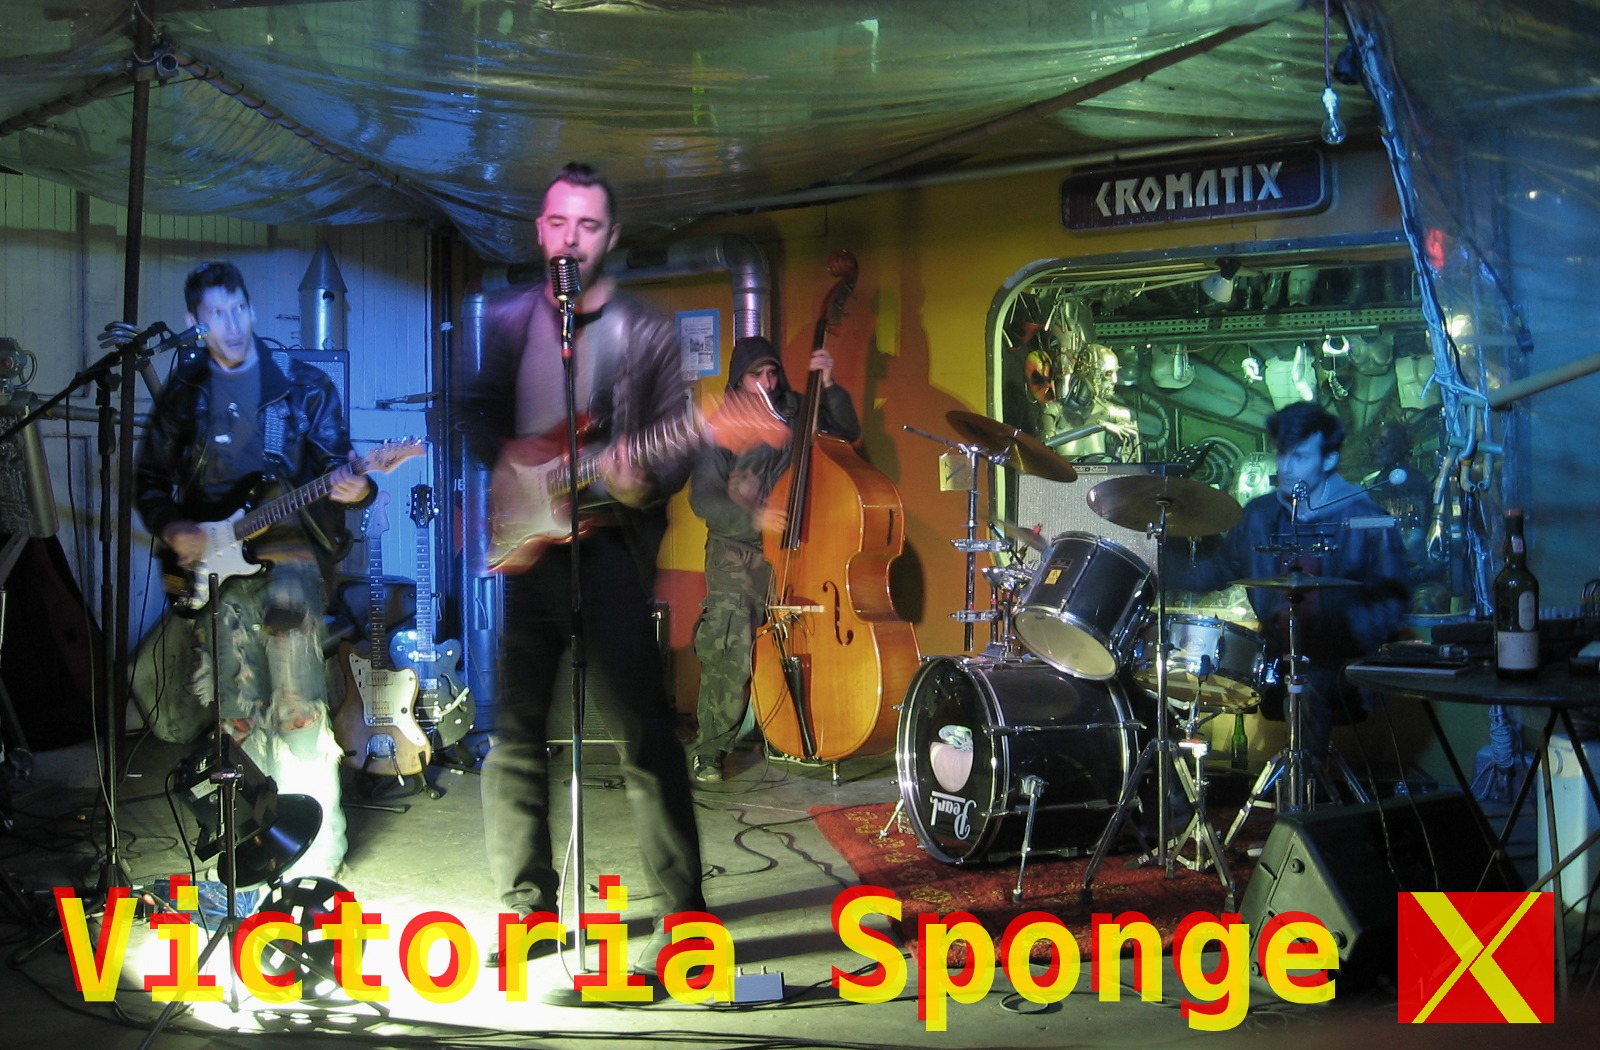 http://la.buvette.org/photos/mixart/victoria-spongex-1.jpg